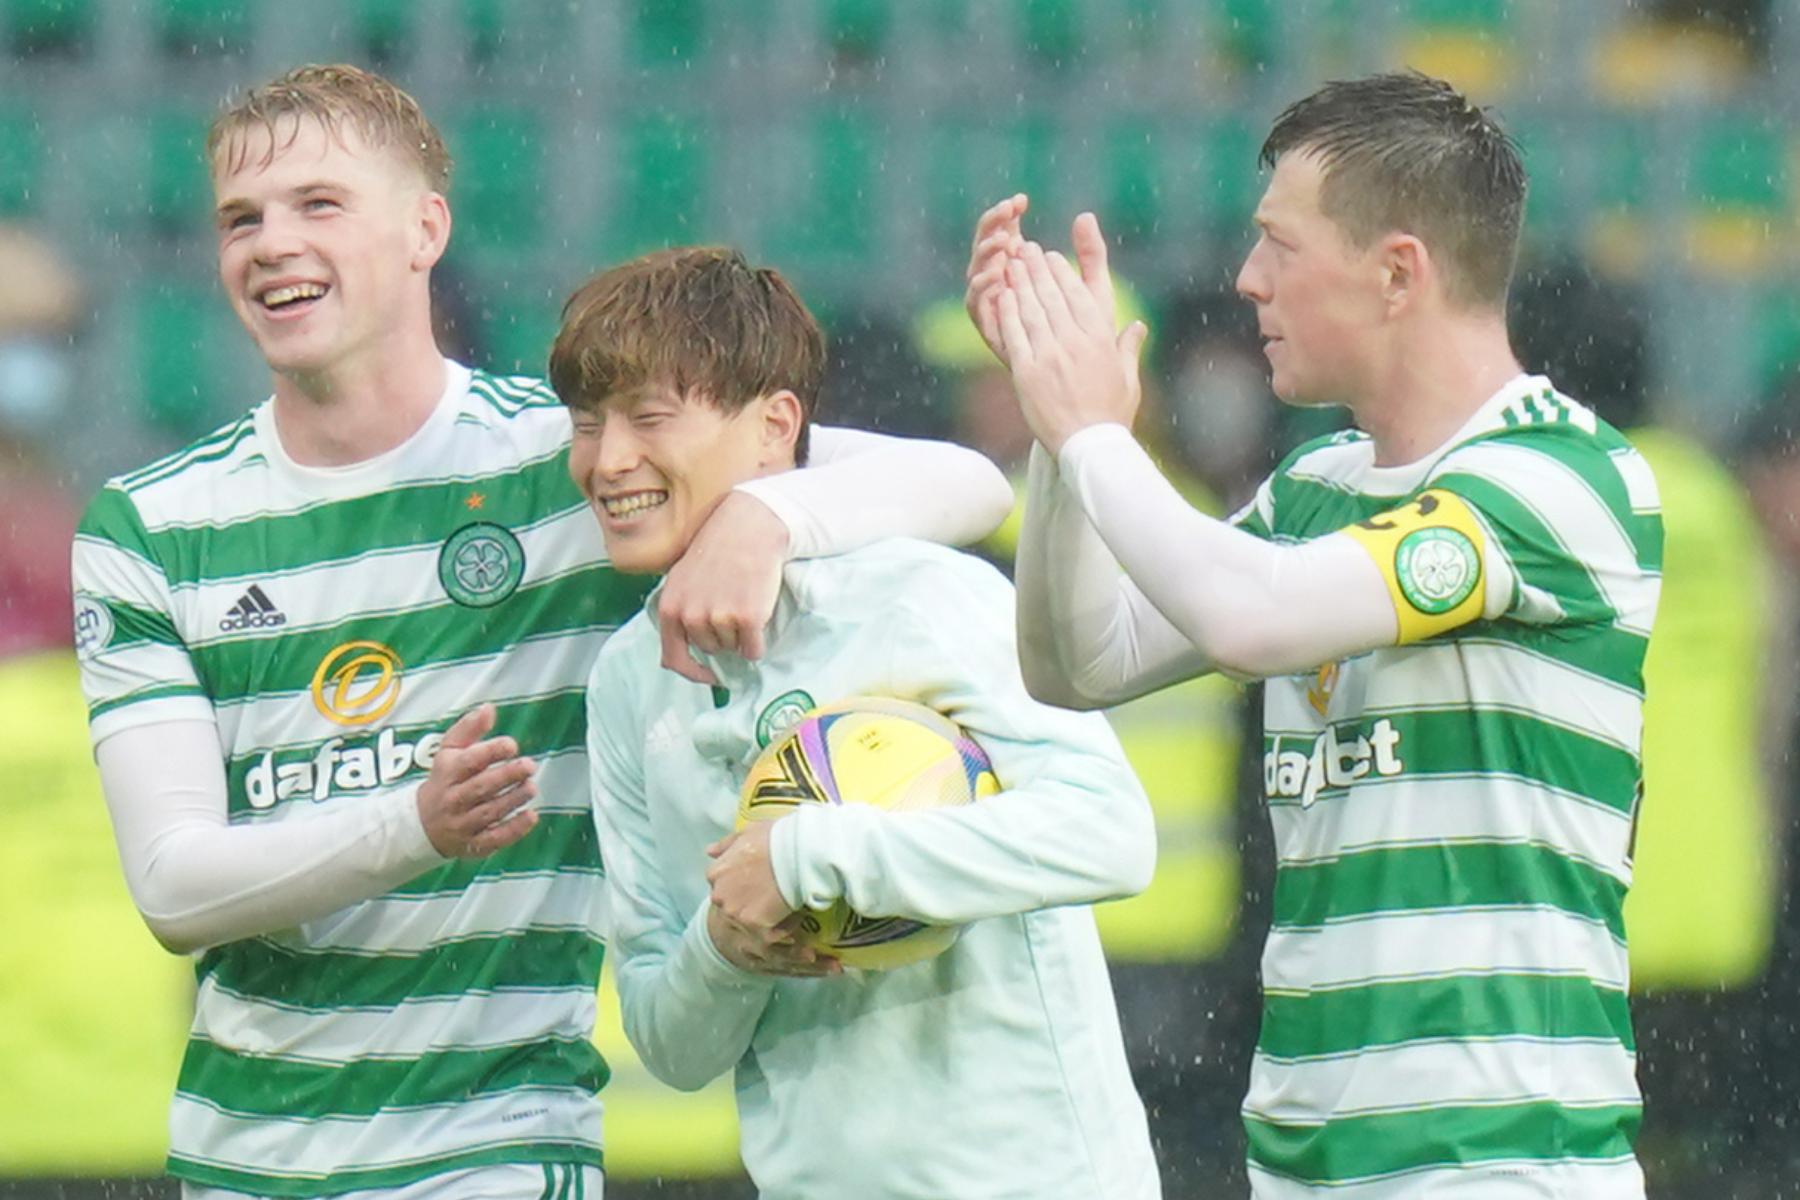 Celtic vs FK Jablonec: TV channel, live stream, kick-off time & team news